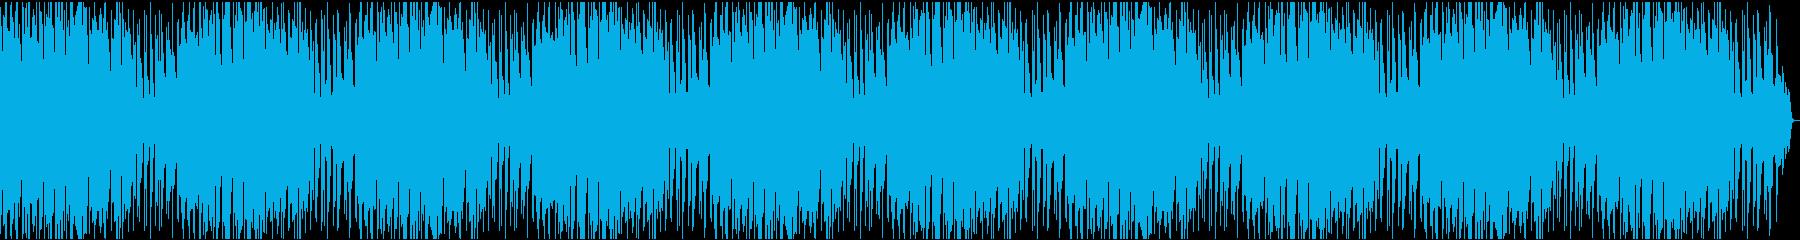 VP2 16分16bit48kHzVerの再生済みの波形